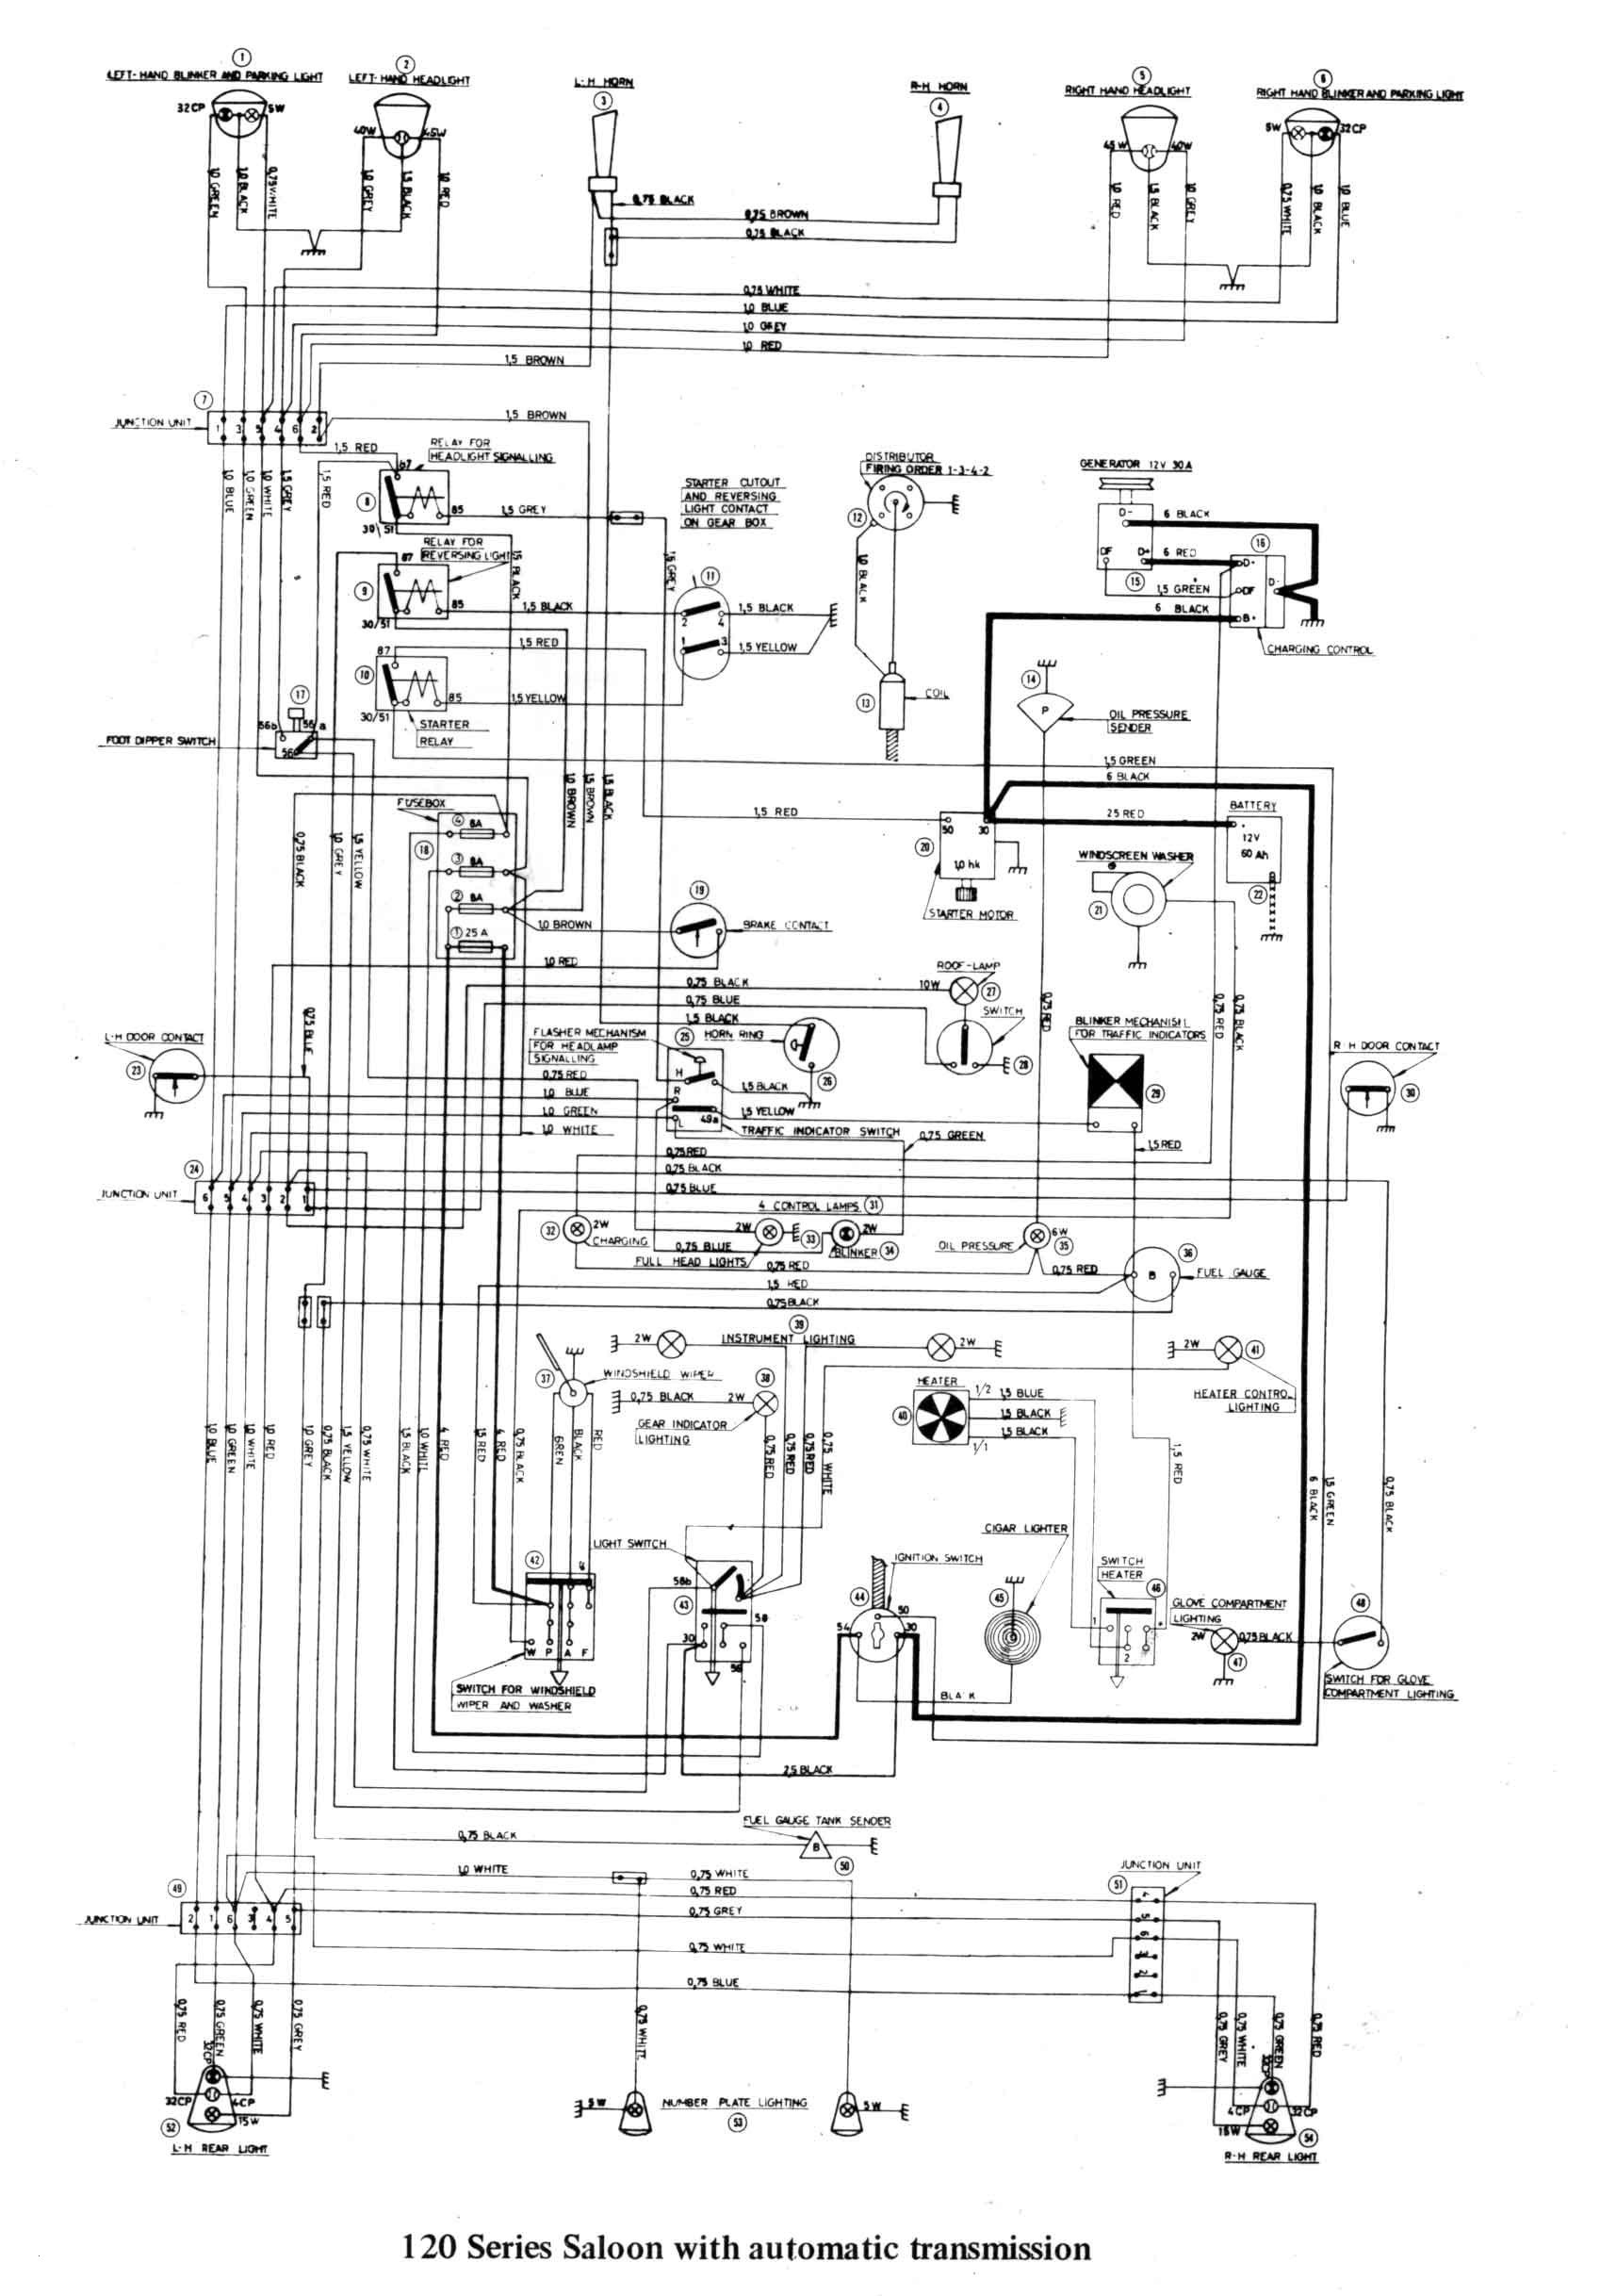 Automobile Engine Diagram Automotive Wiring Diagrams Schaferforcongressfo Of Automobile Engine Diagram